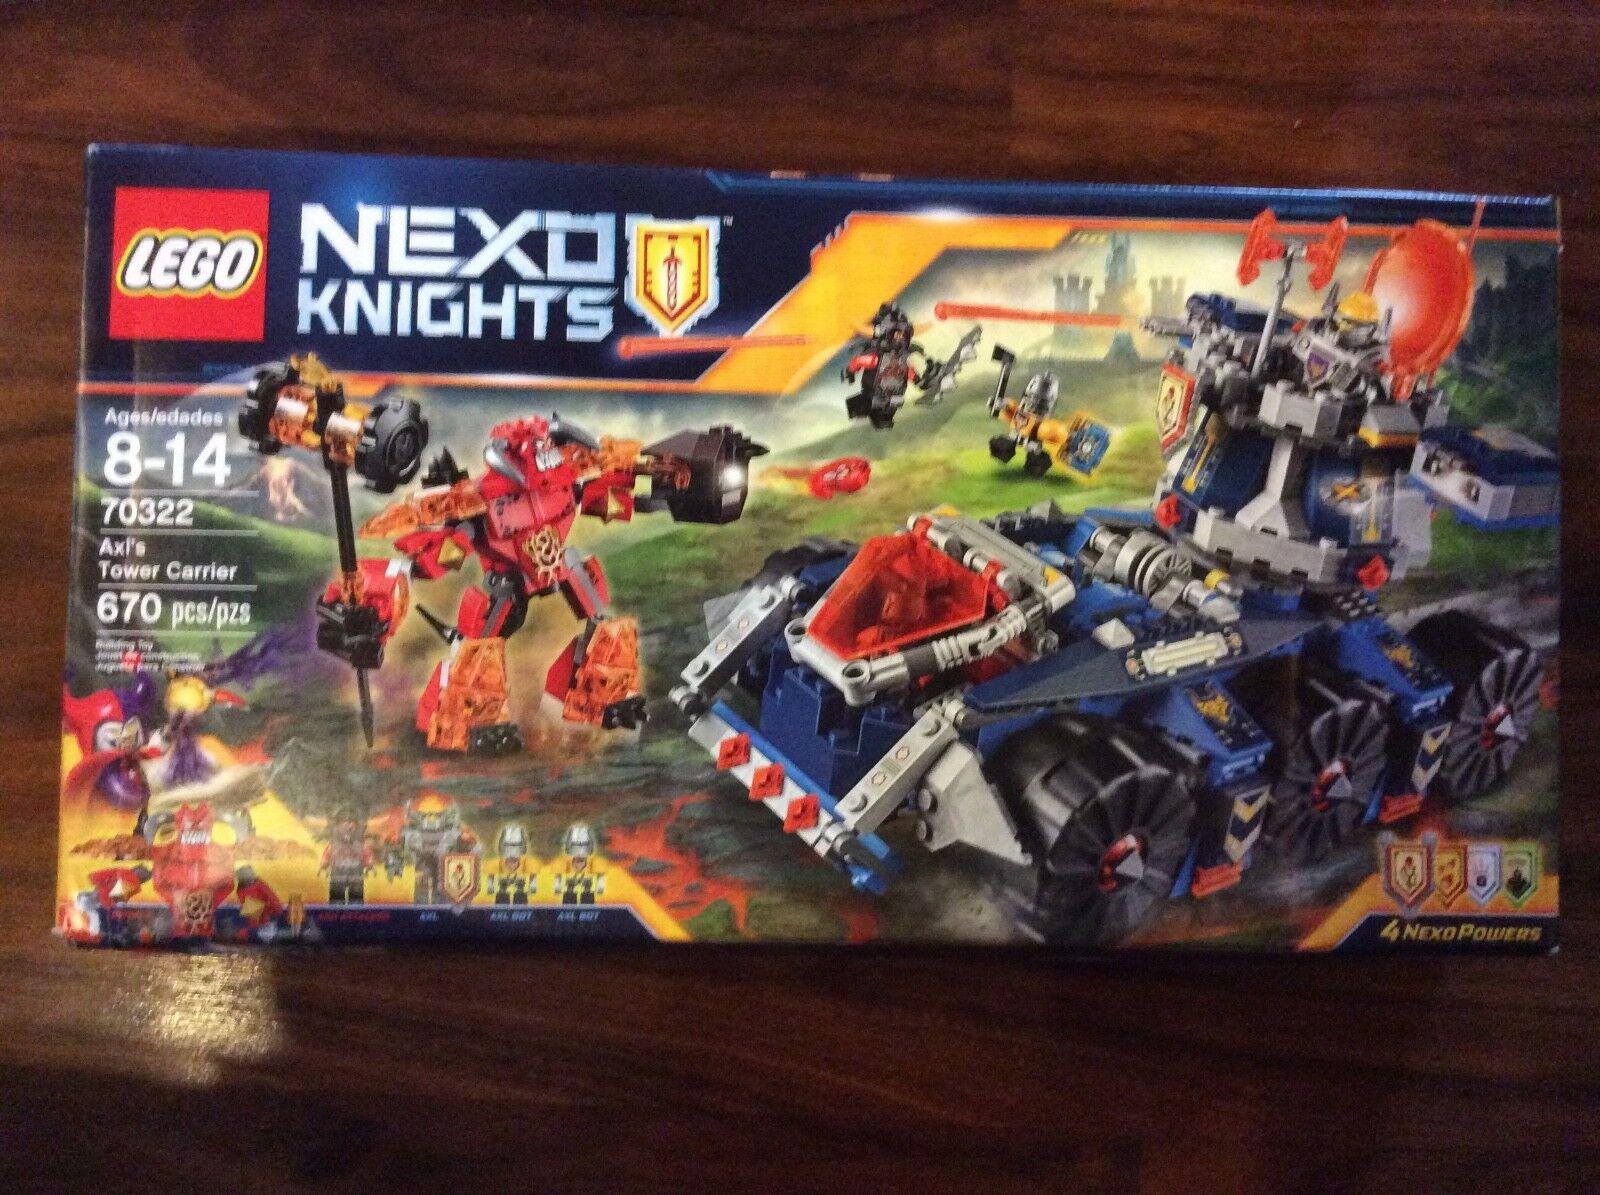 New Lego Nexo Knights Axl'sTower Carrier Set 70322 70322 70322 in Sealed Box Shelfwear 3717f1